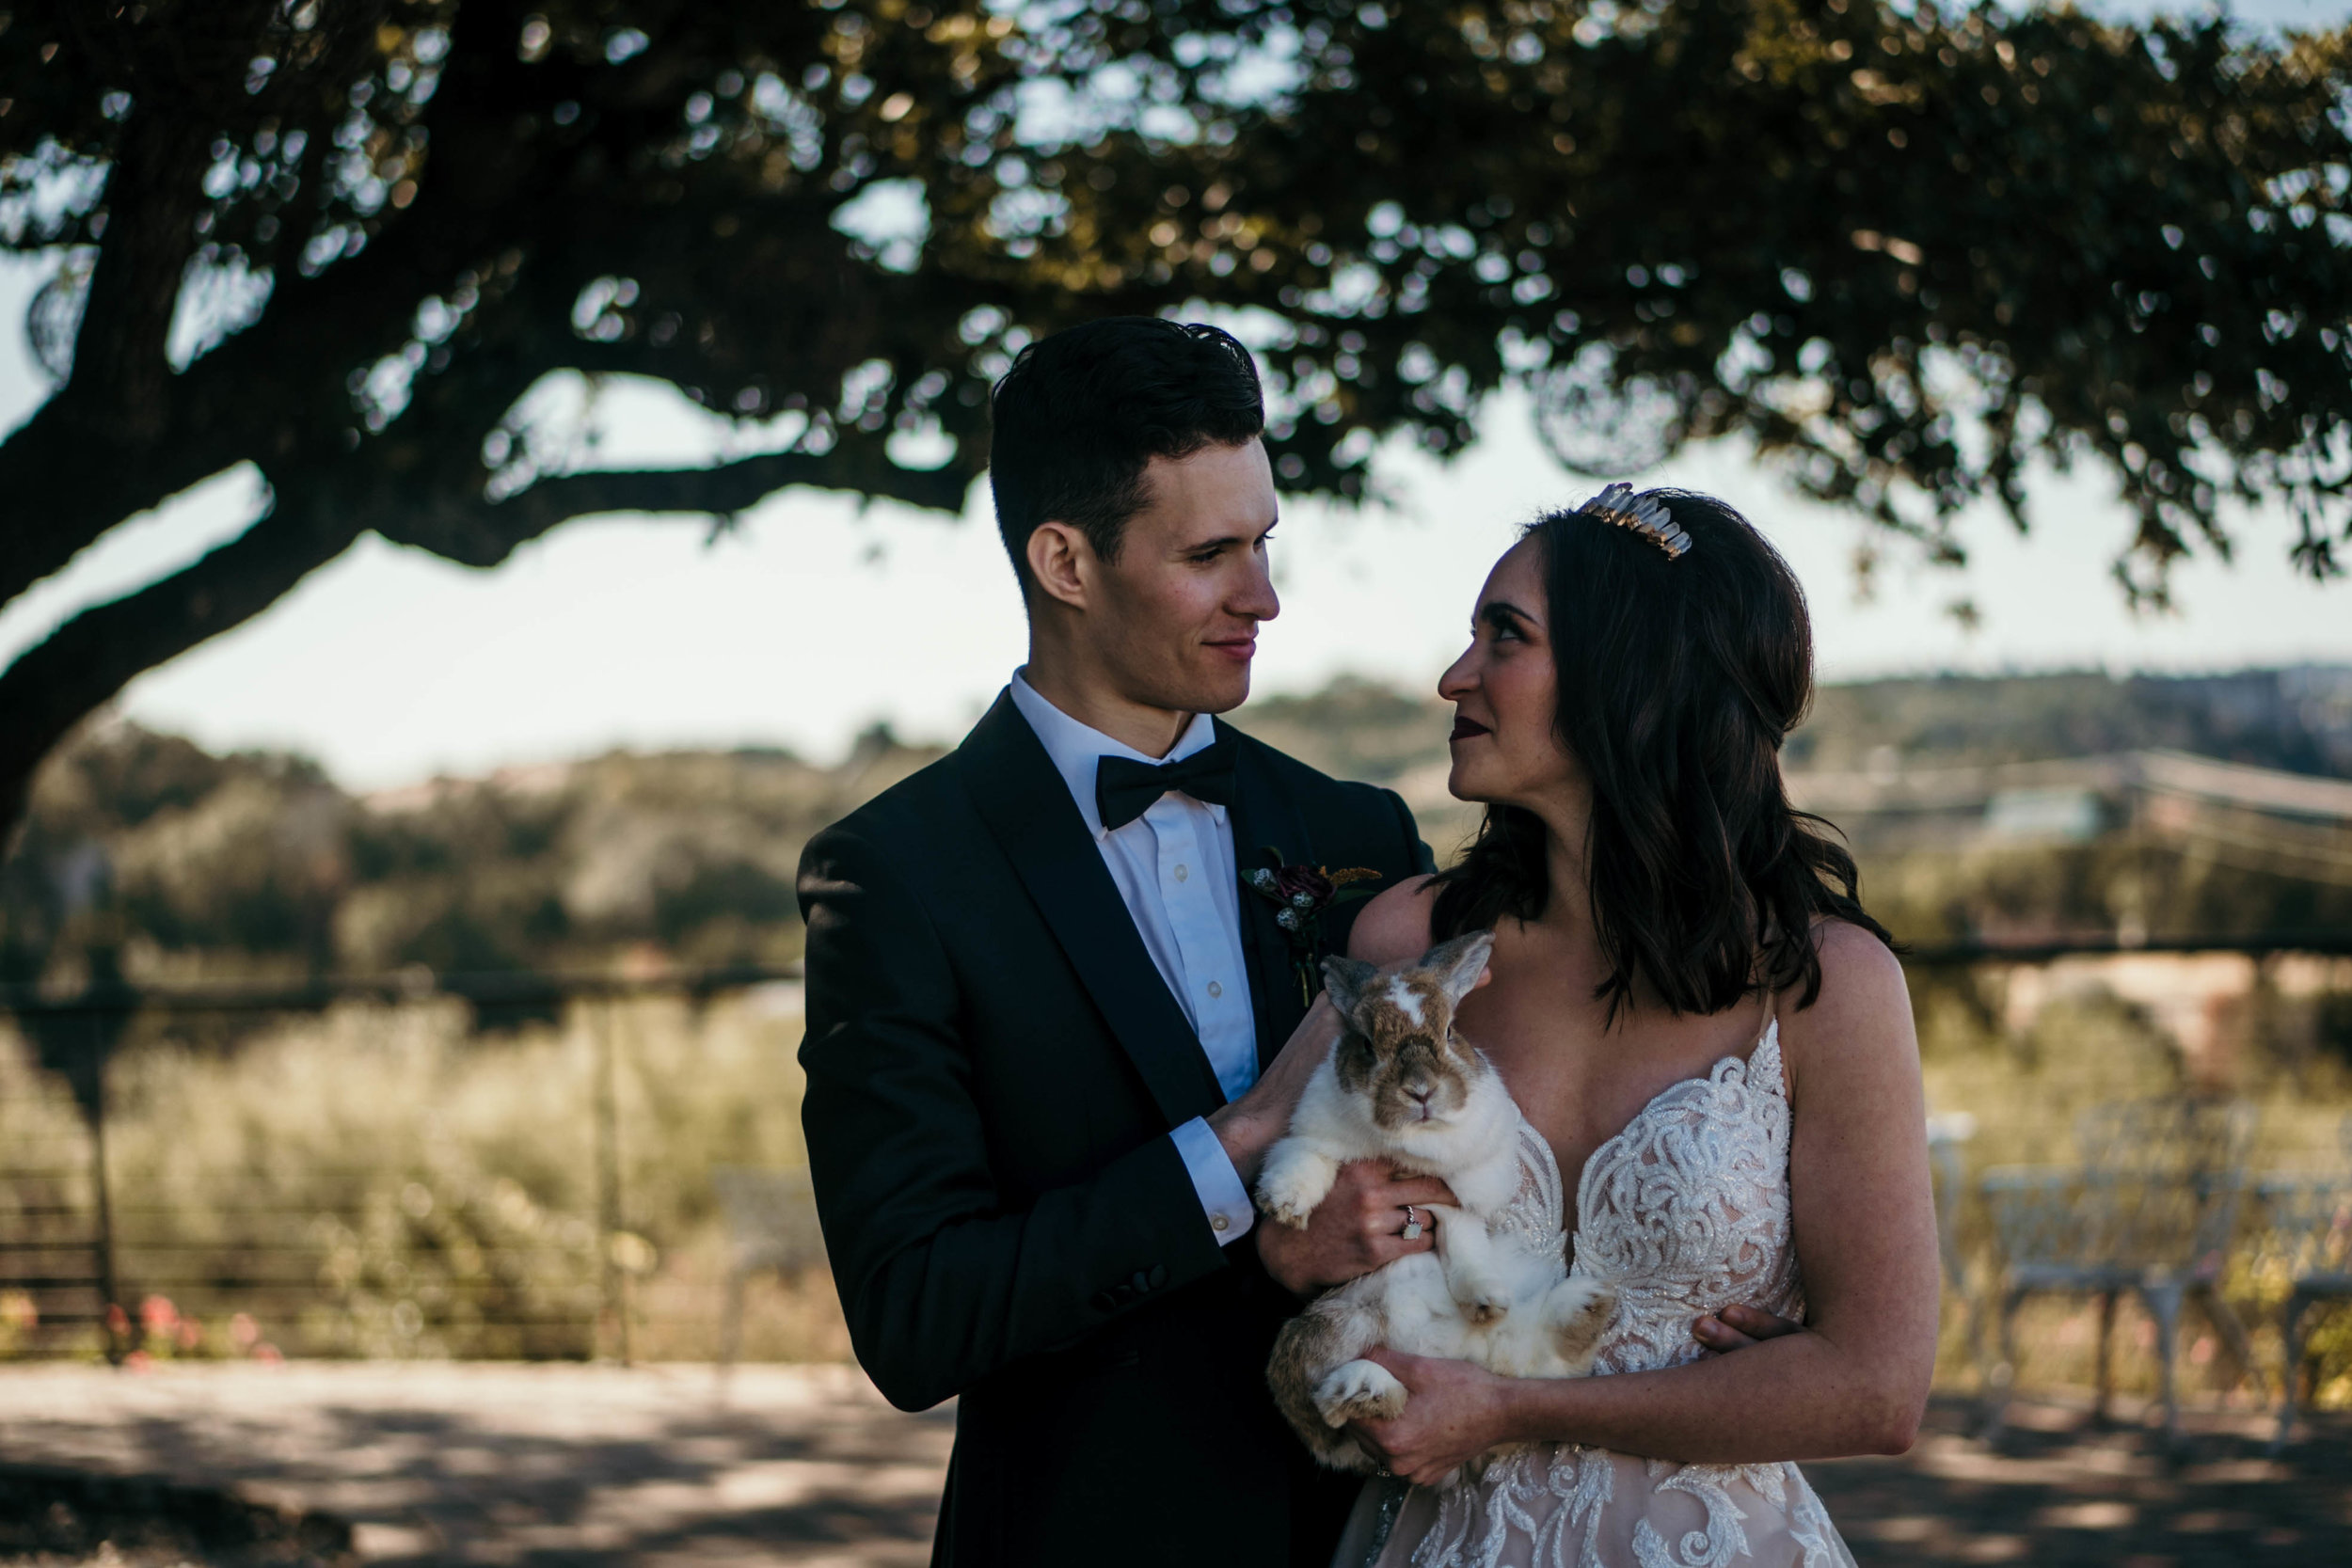 Austin Wedding Videographer - Dolls for Dolls (154 of 323).jpg